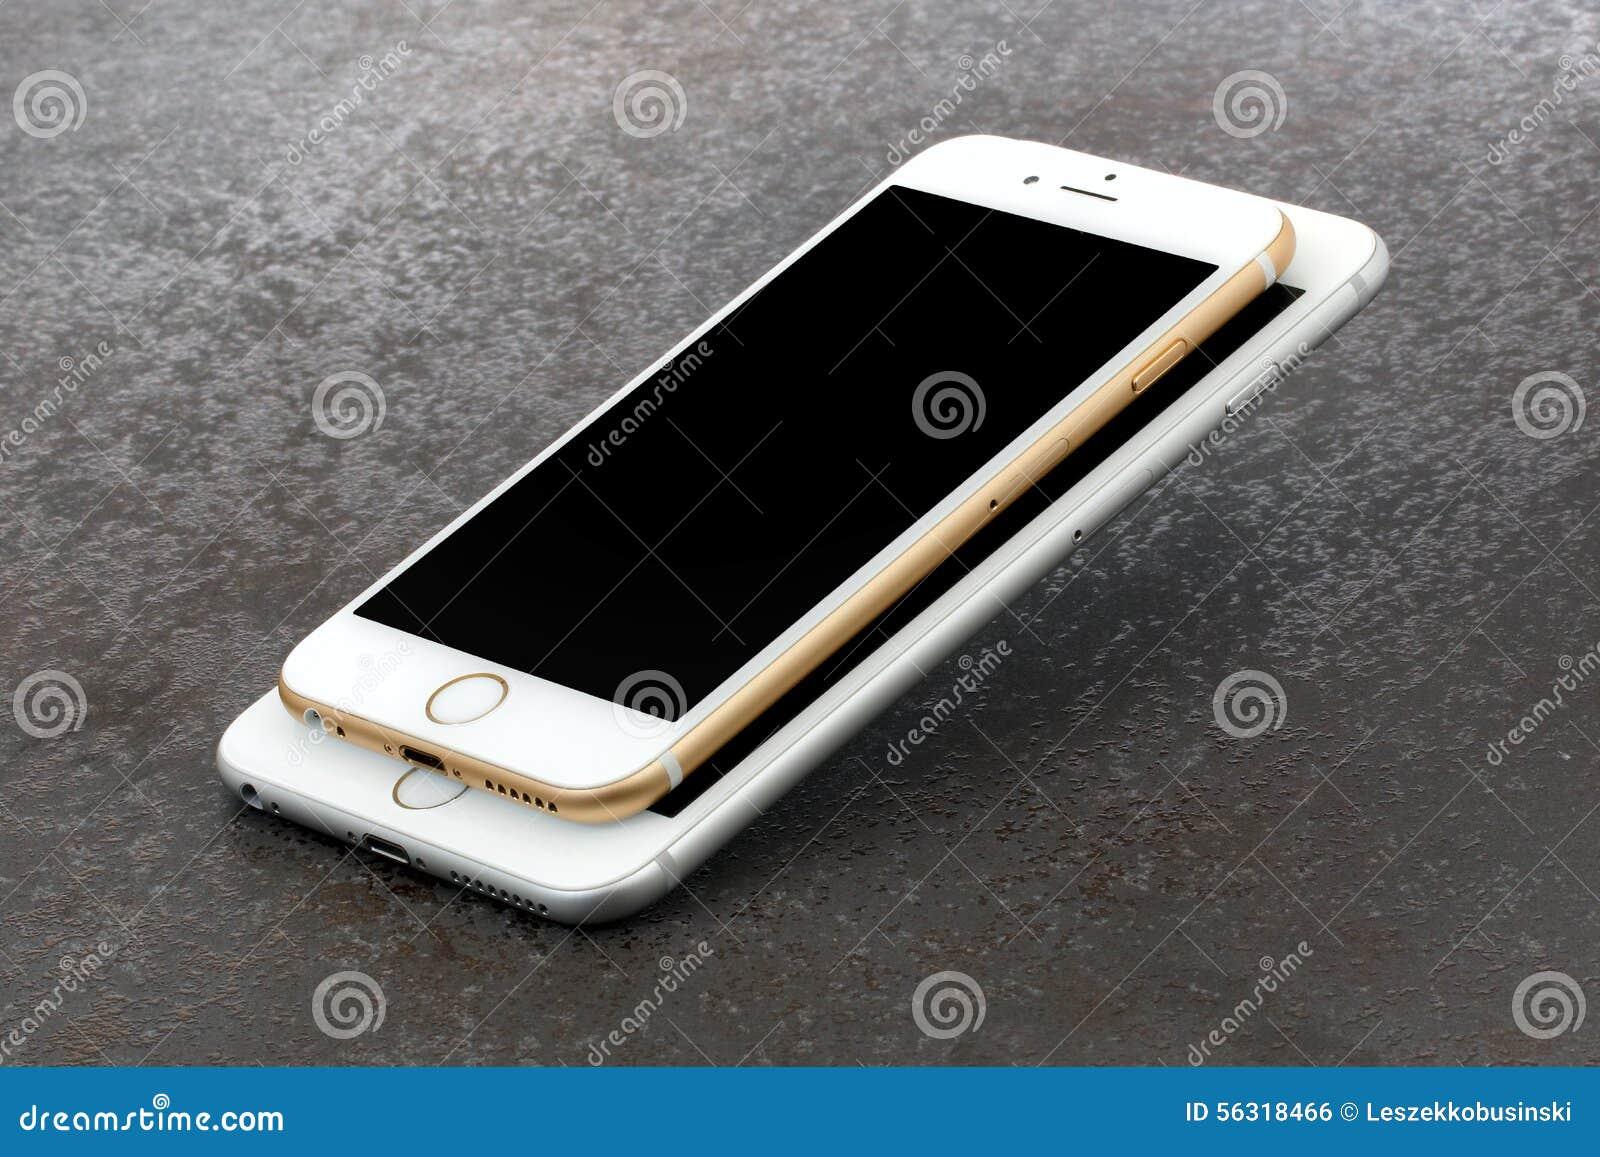 l 39 iphone 6 de diff rence de taille et iphone 6 plus photo ditorial image 56318466. Black Bedroom Furniture Sets. Home Design Ideas